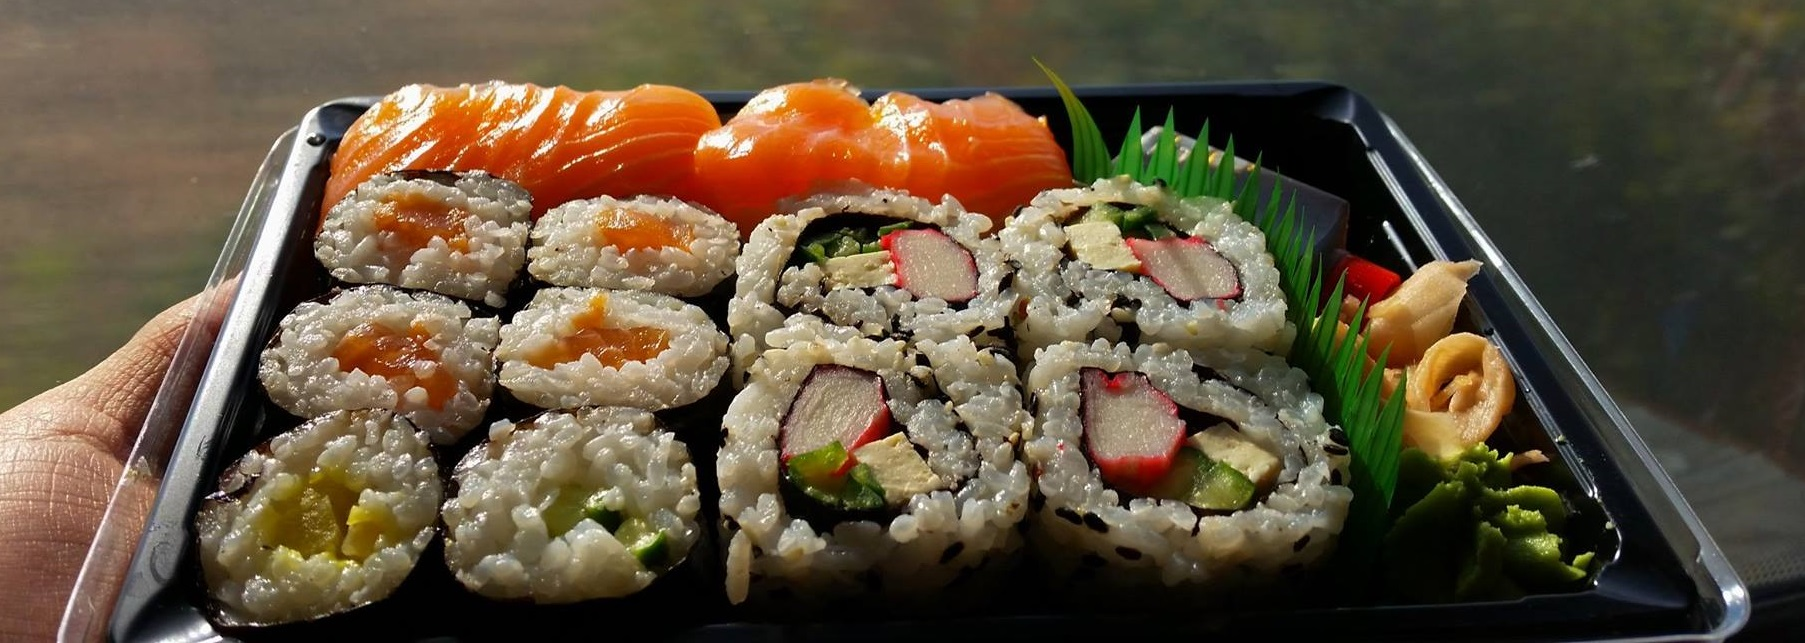 regiojet-prague-ostrava-business-class-sushi.jpg